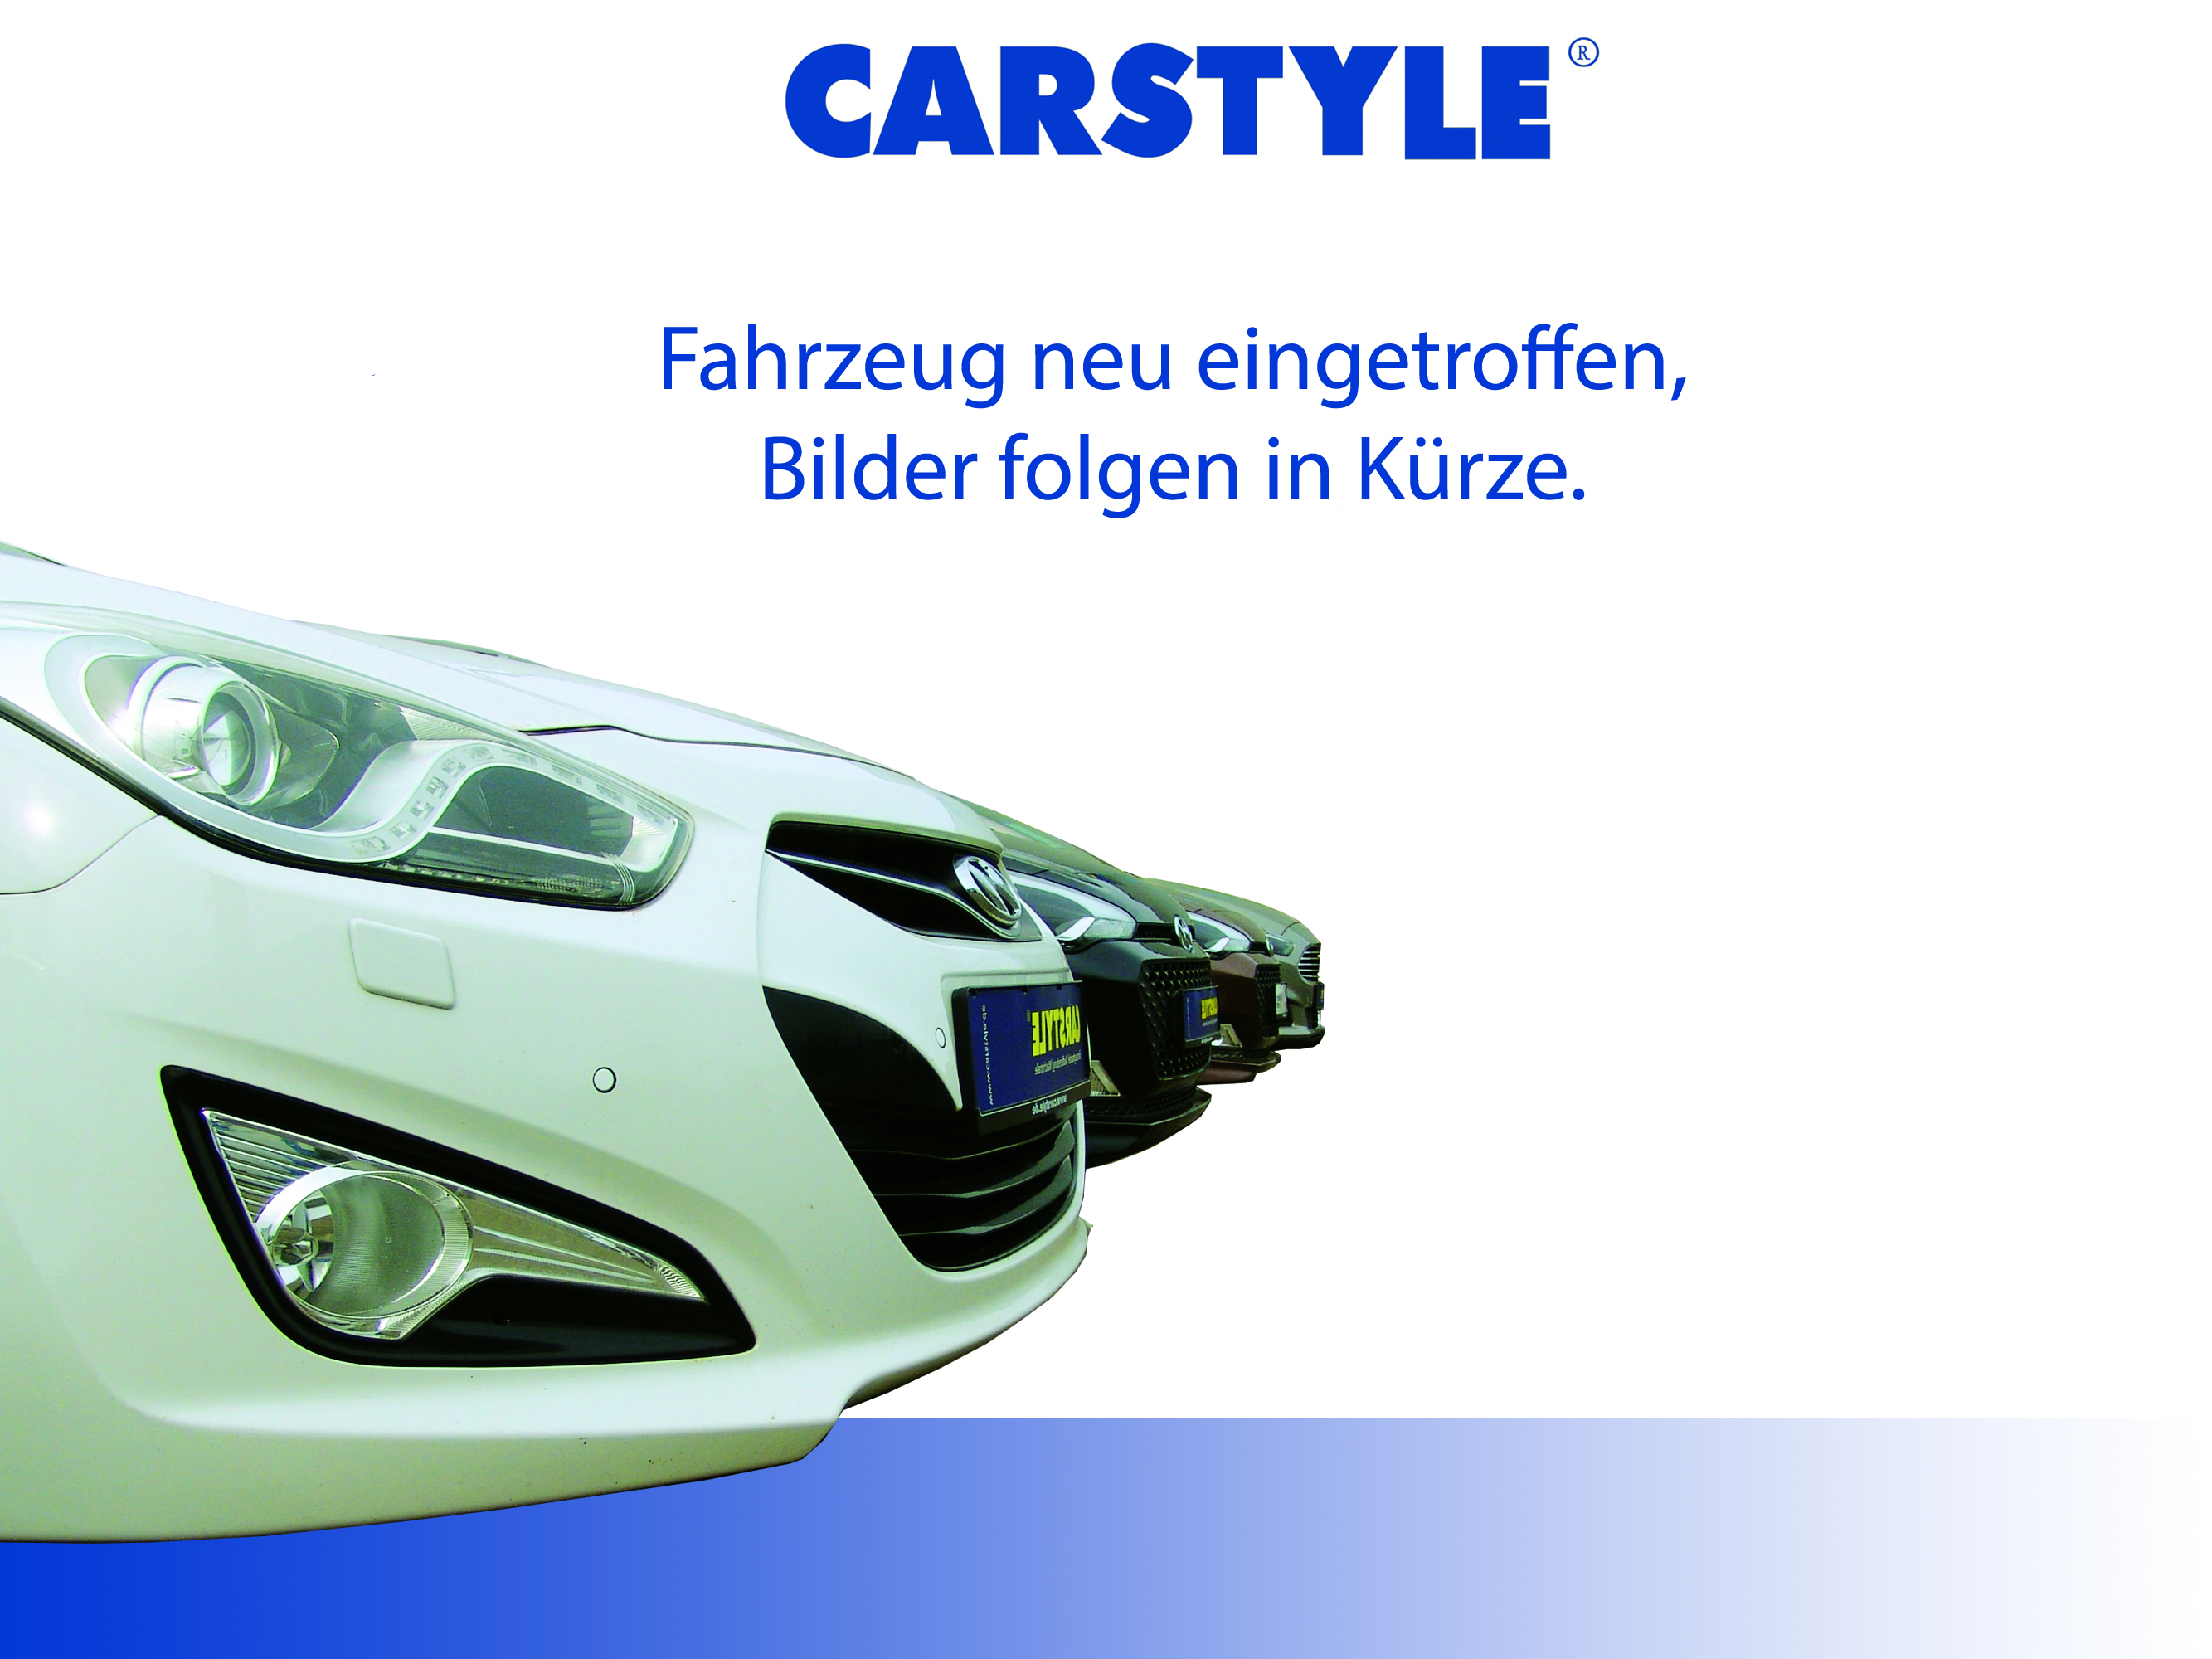 Mercedes-Benz SLK 230 Kompressor Cabrio/Roadster